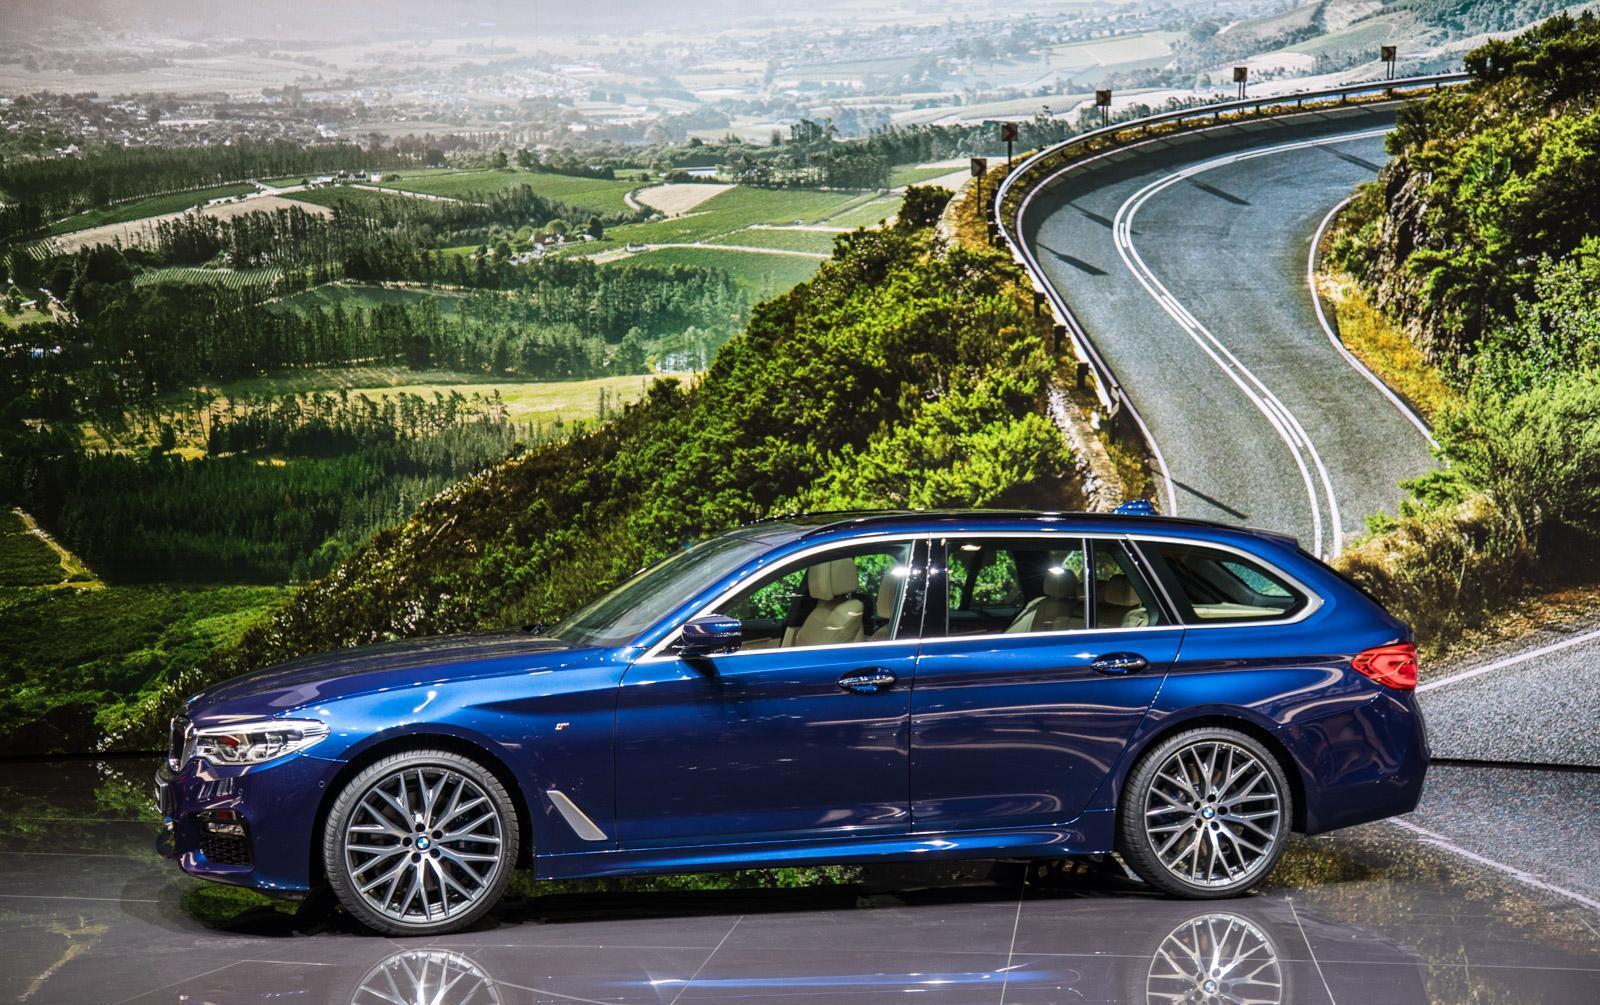 BMW-5-serie-touring-002